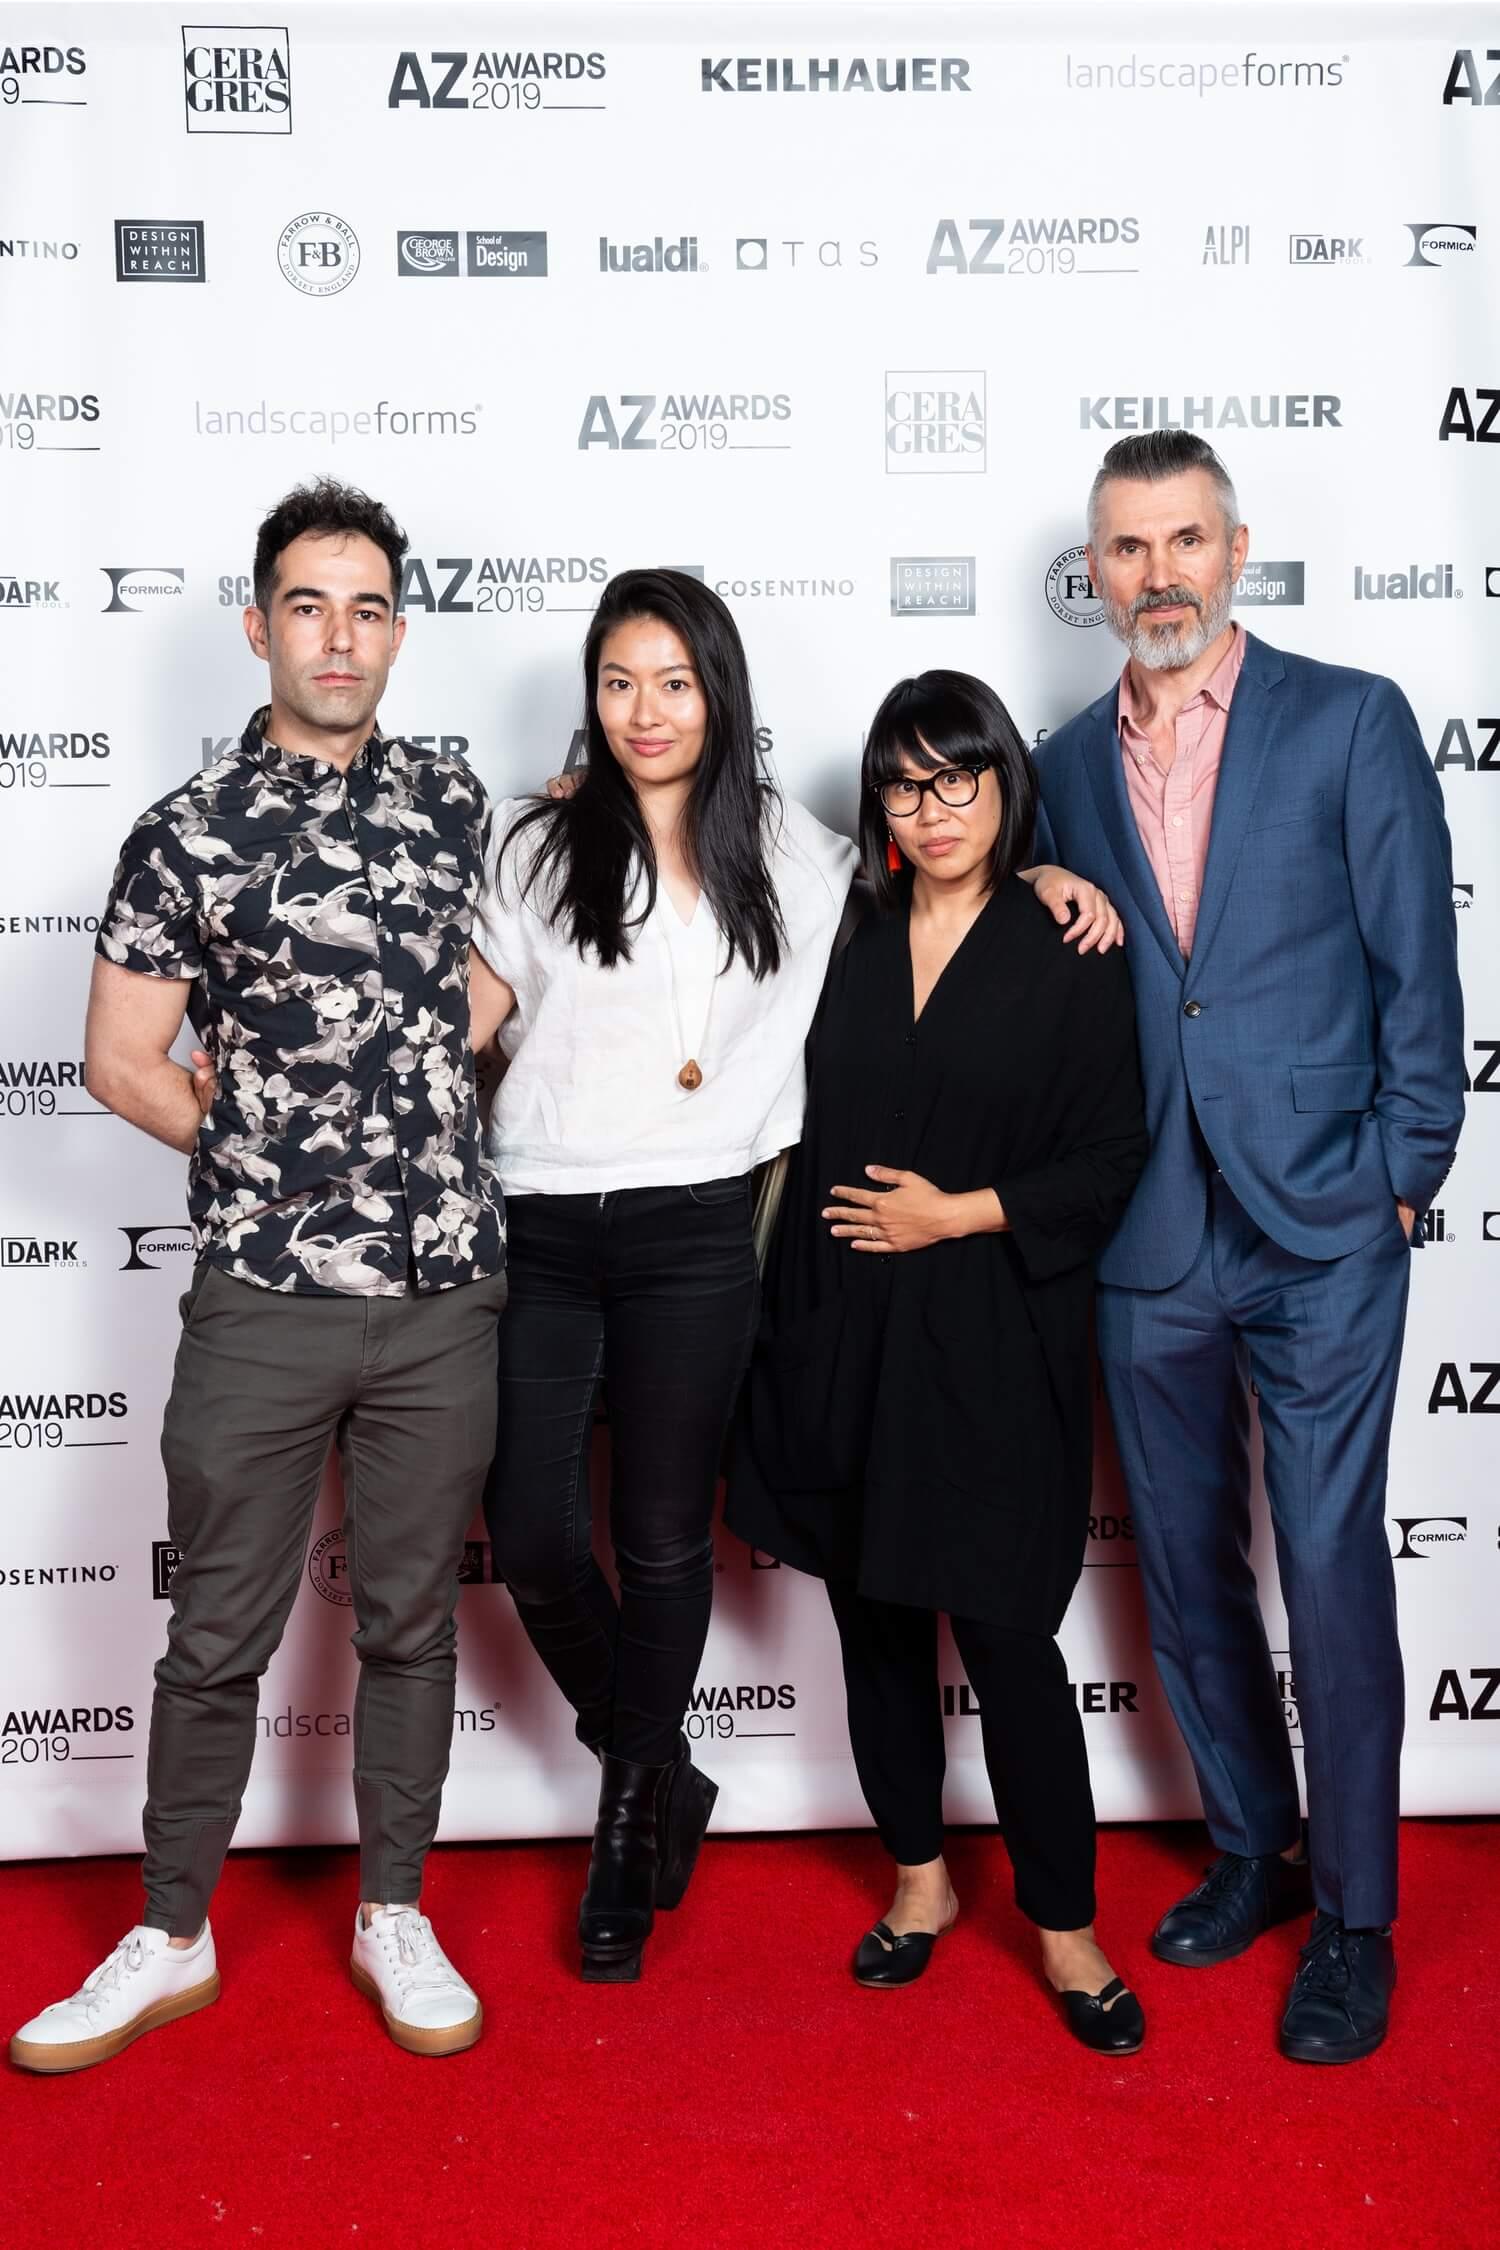 Designers Fraser Greenberg, Christian Lo, Deborah Wang and Dragan Vuko, AZ Awards 2019: Scenes from the Gala